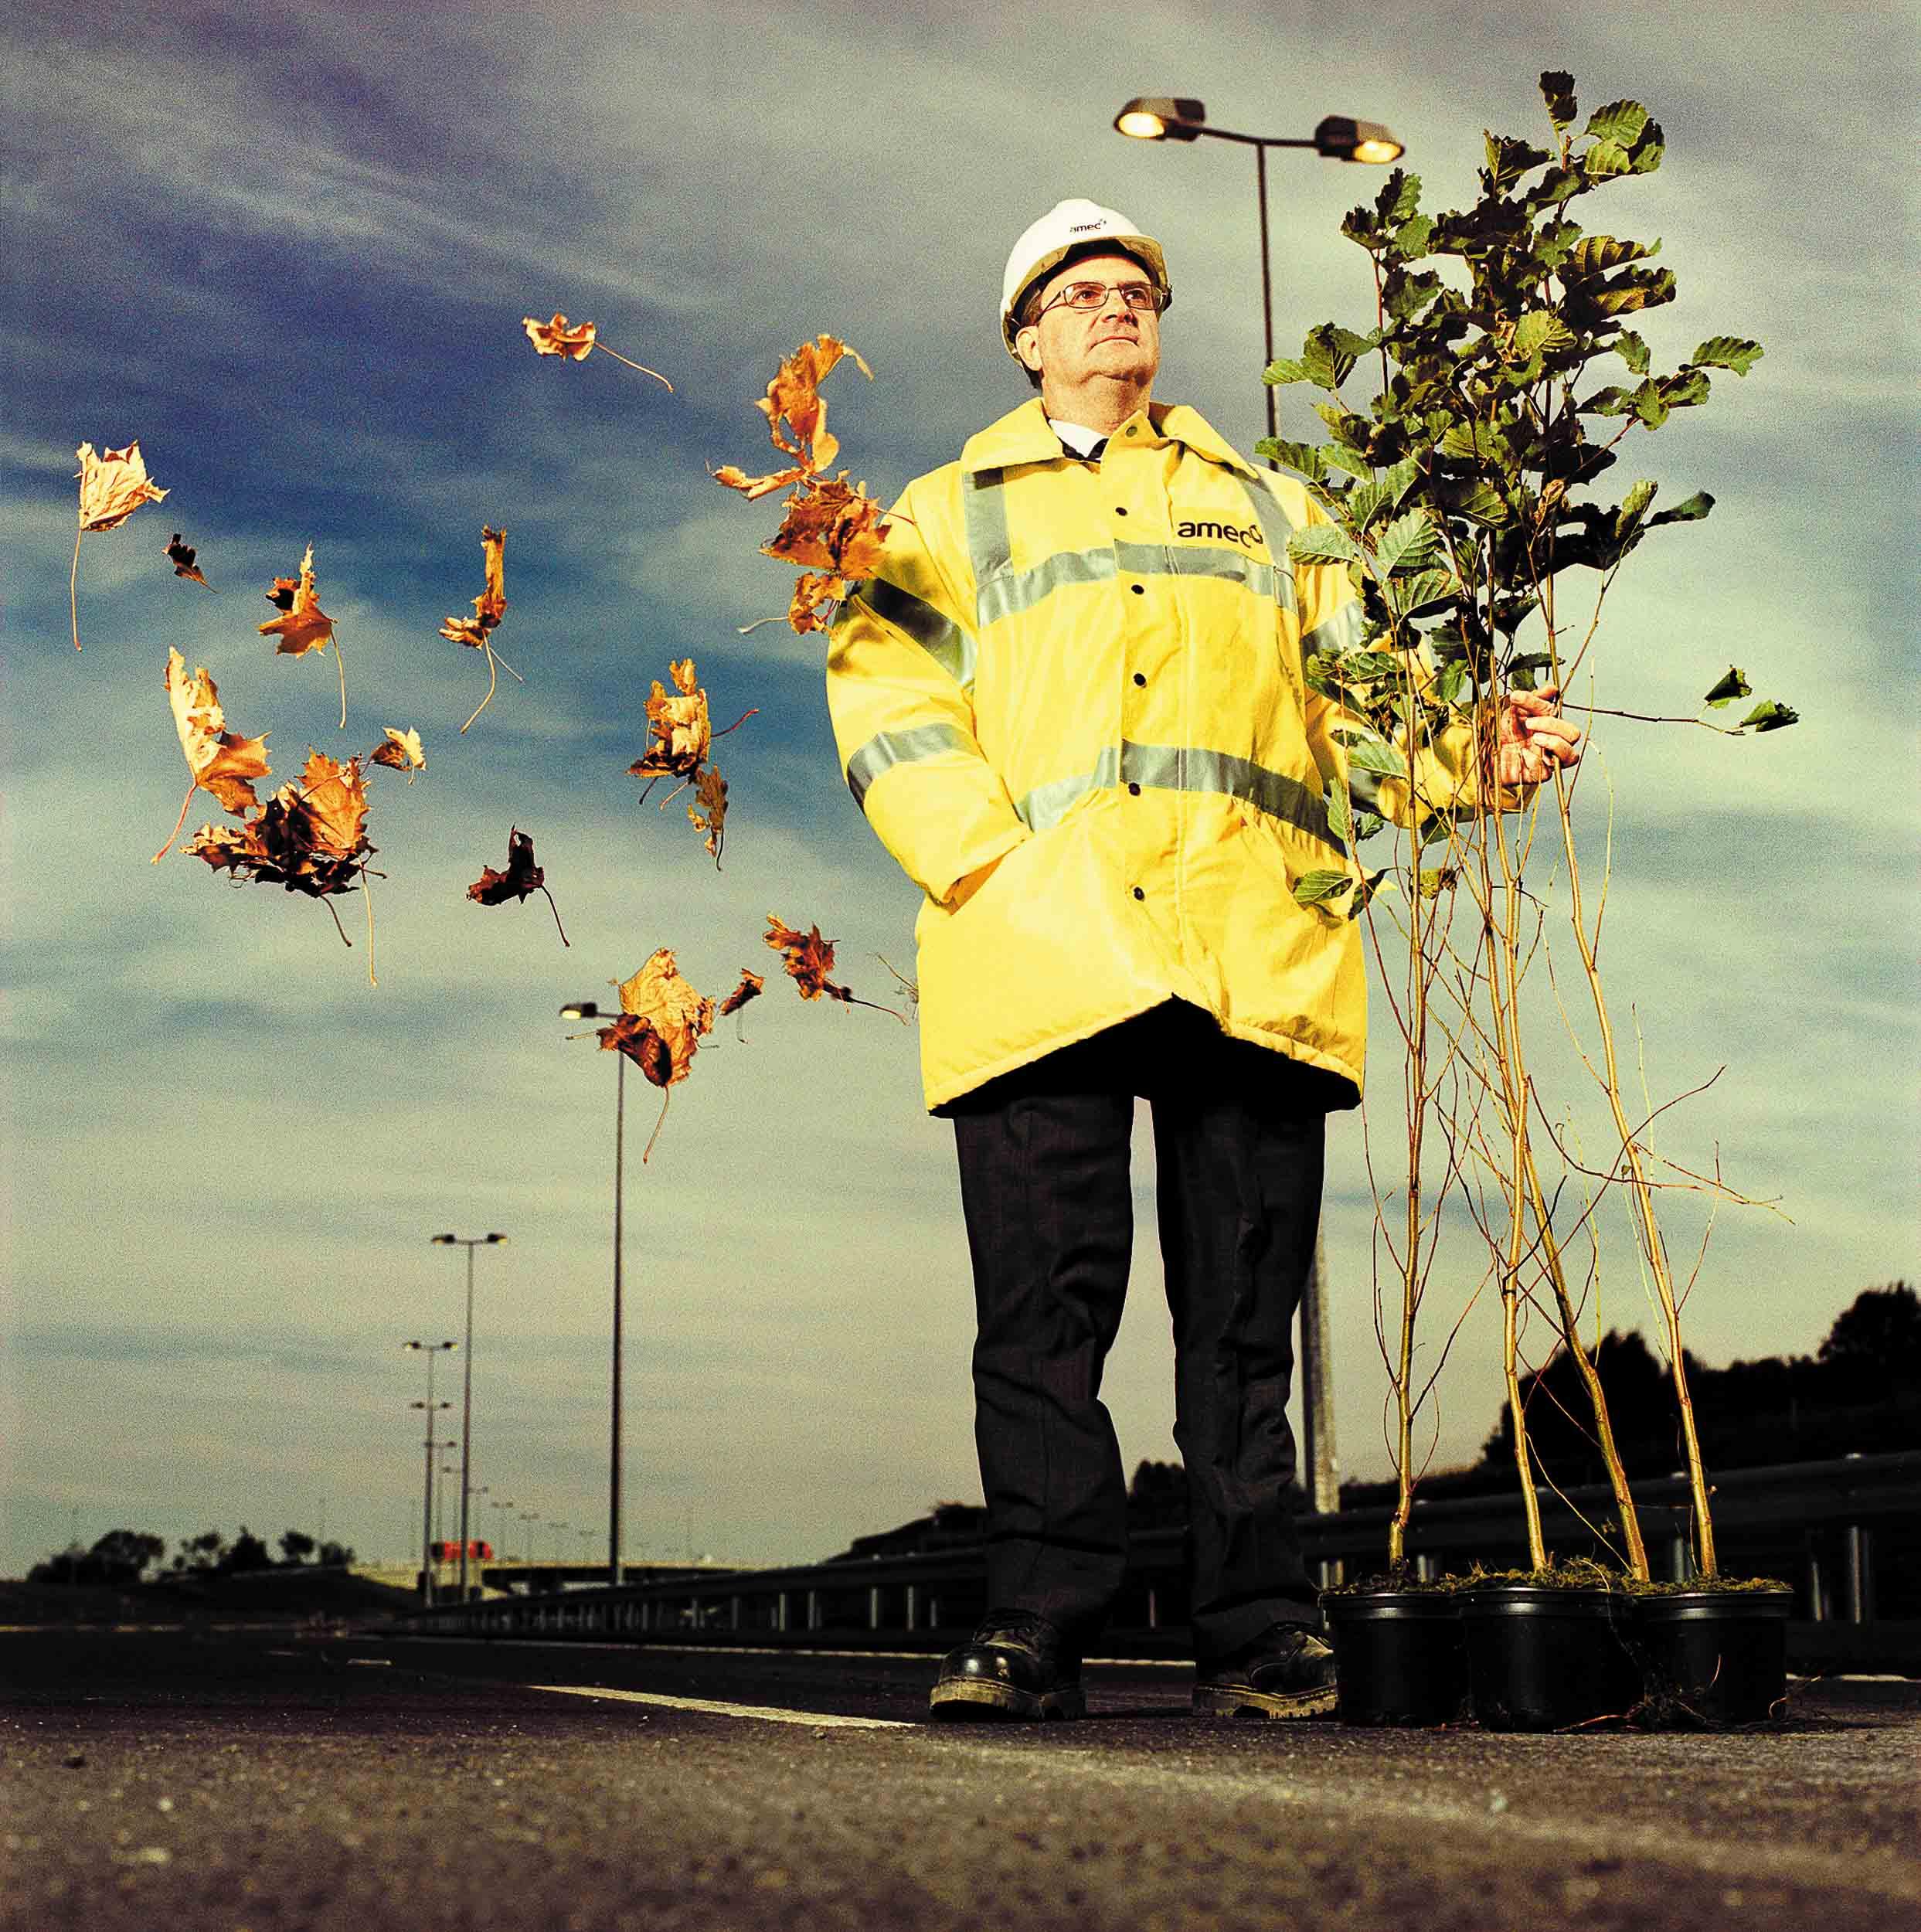 www.iaincrockart.com_portrait-AMEC1-2.jpg